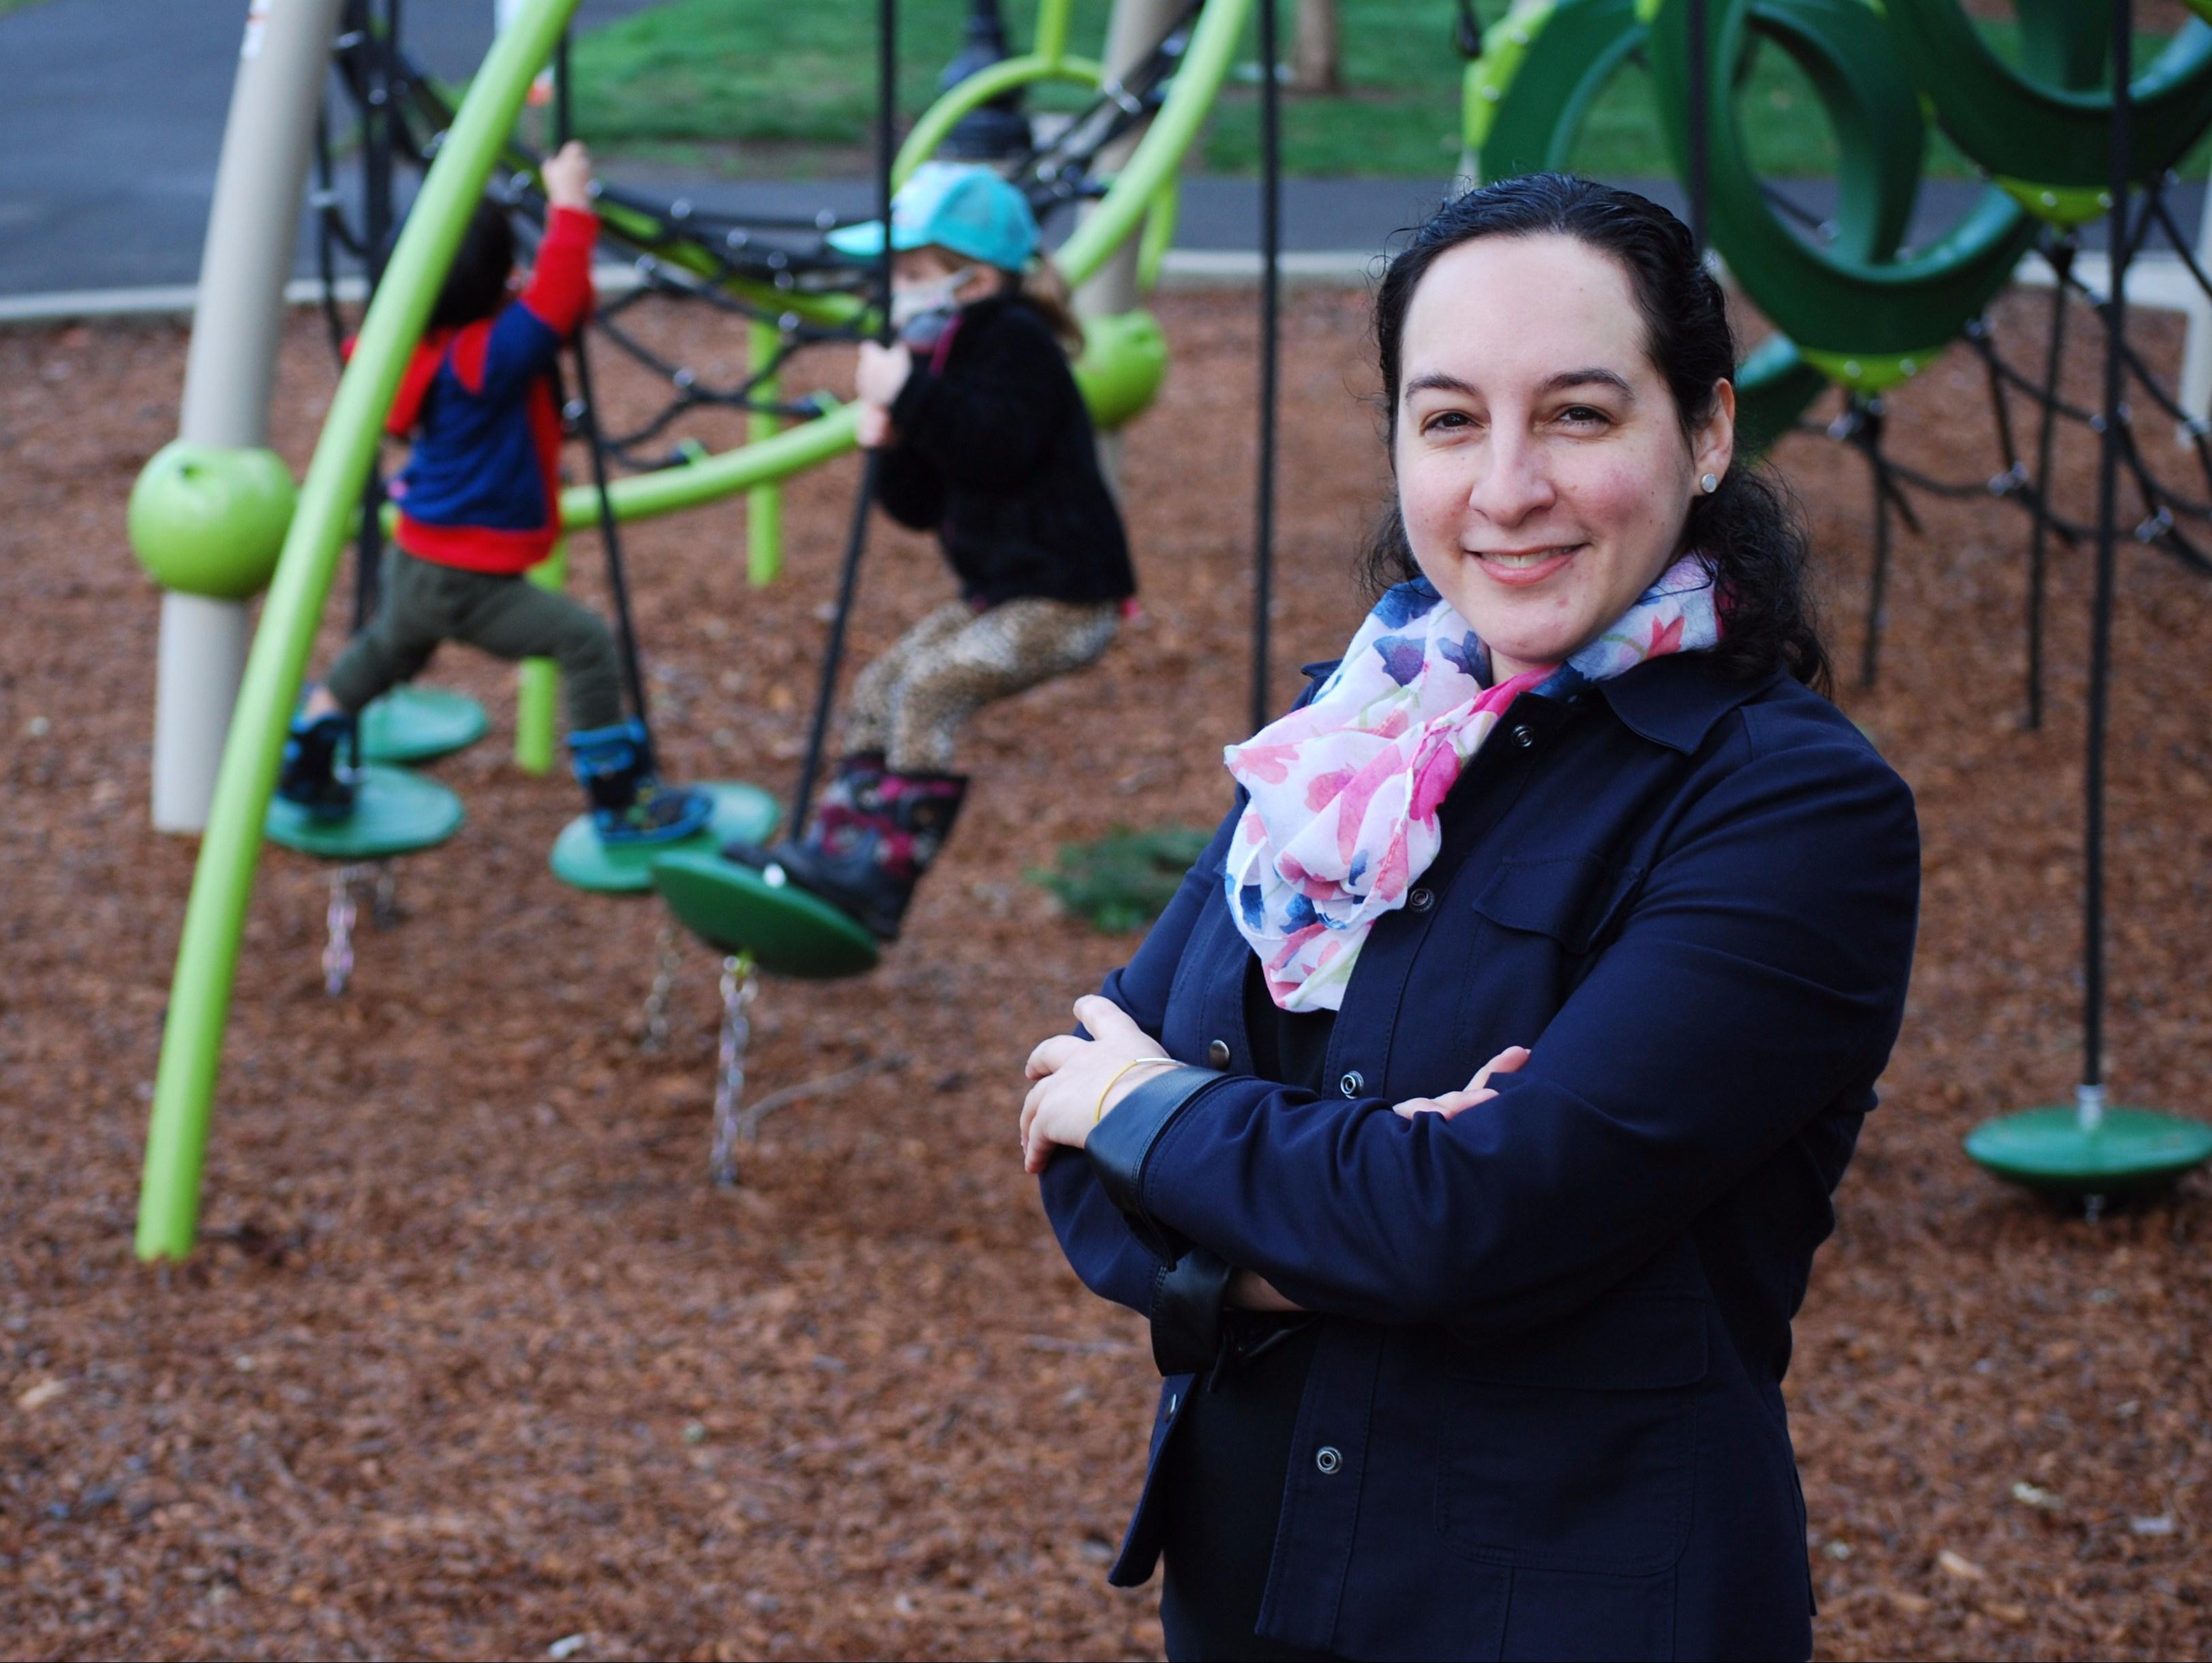 Felicita at a playground